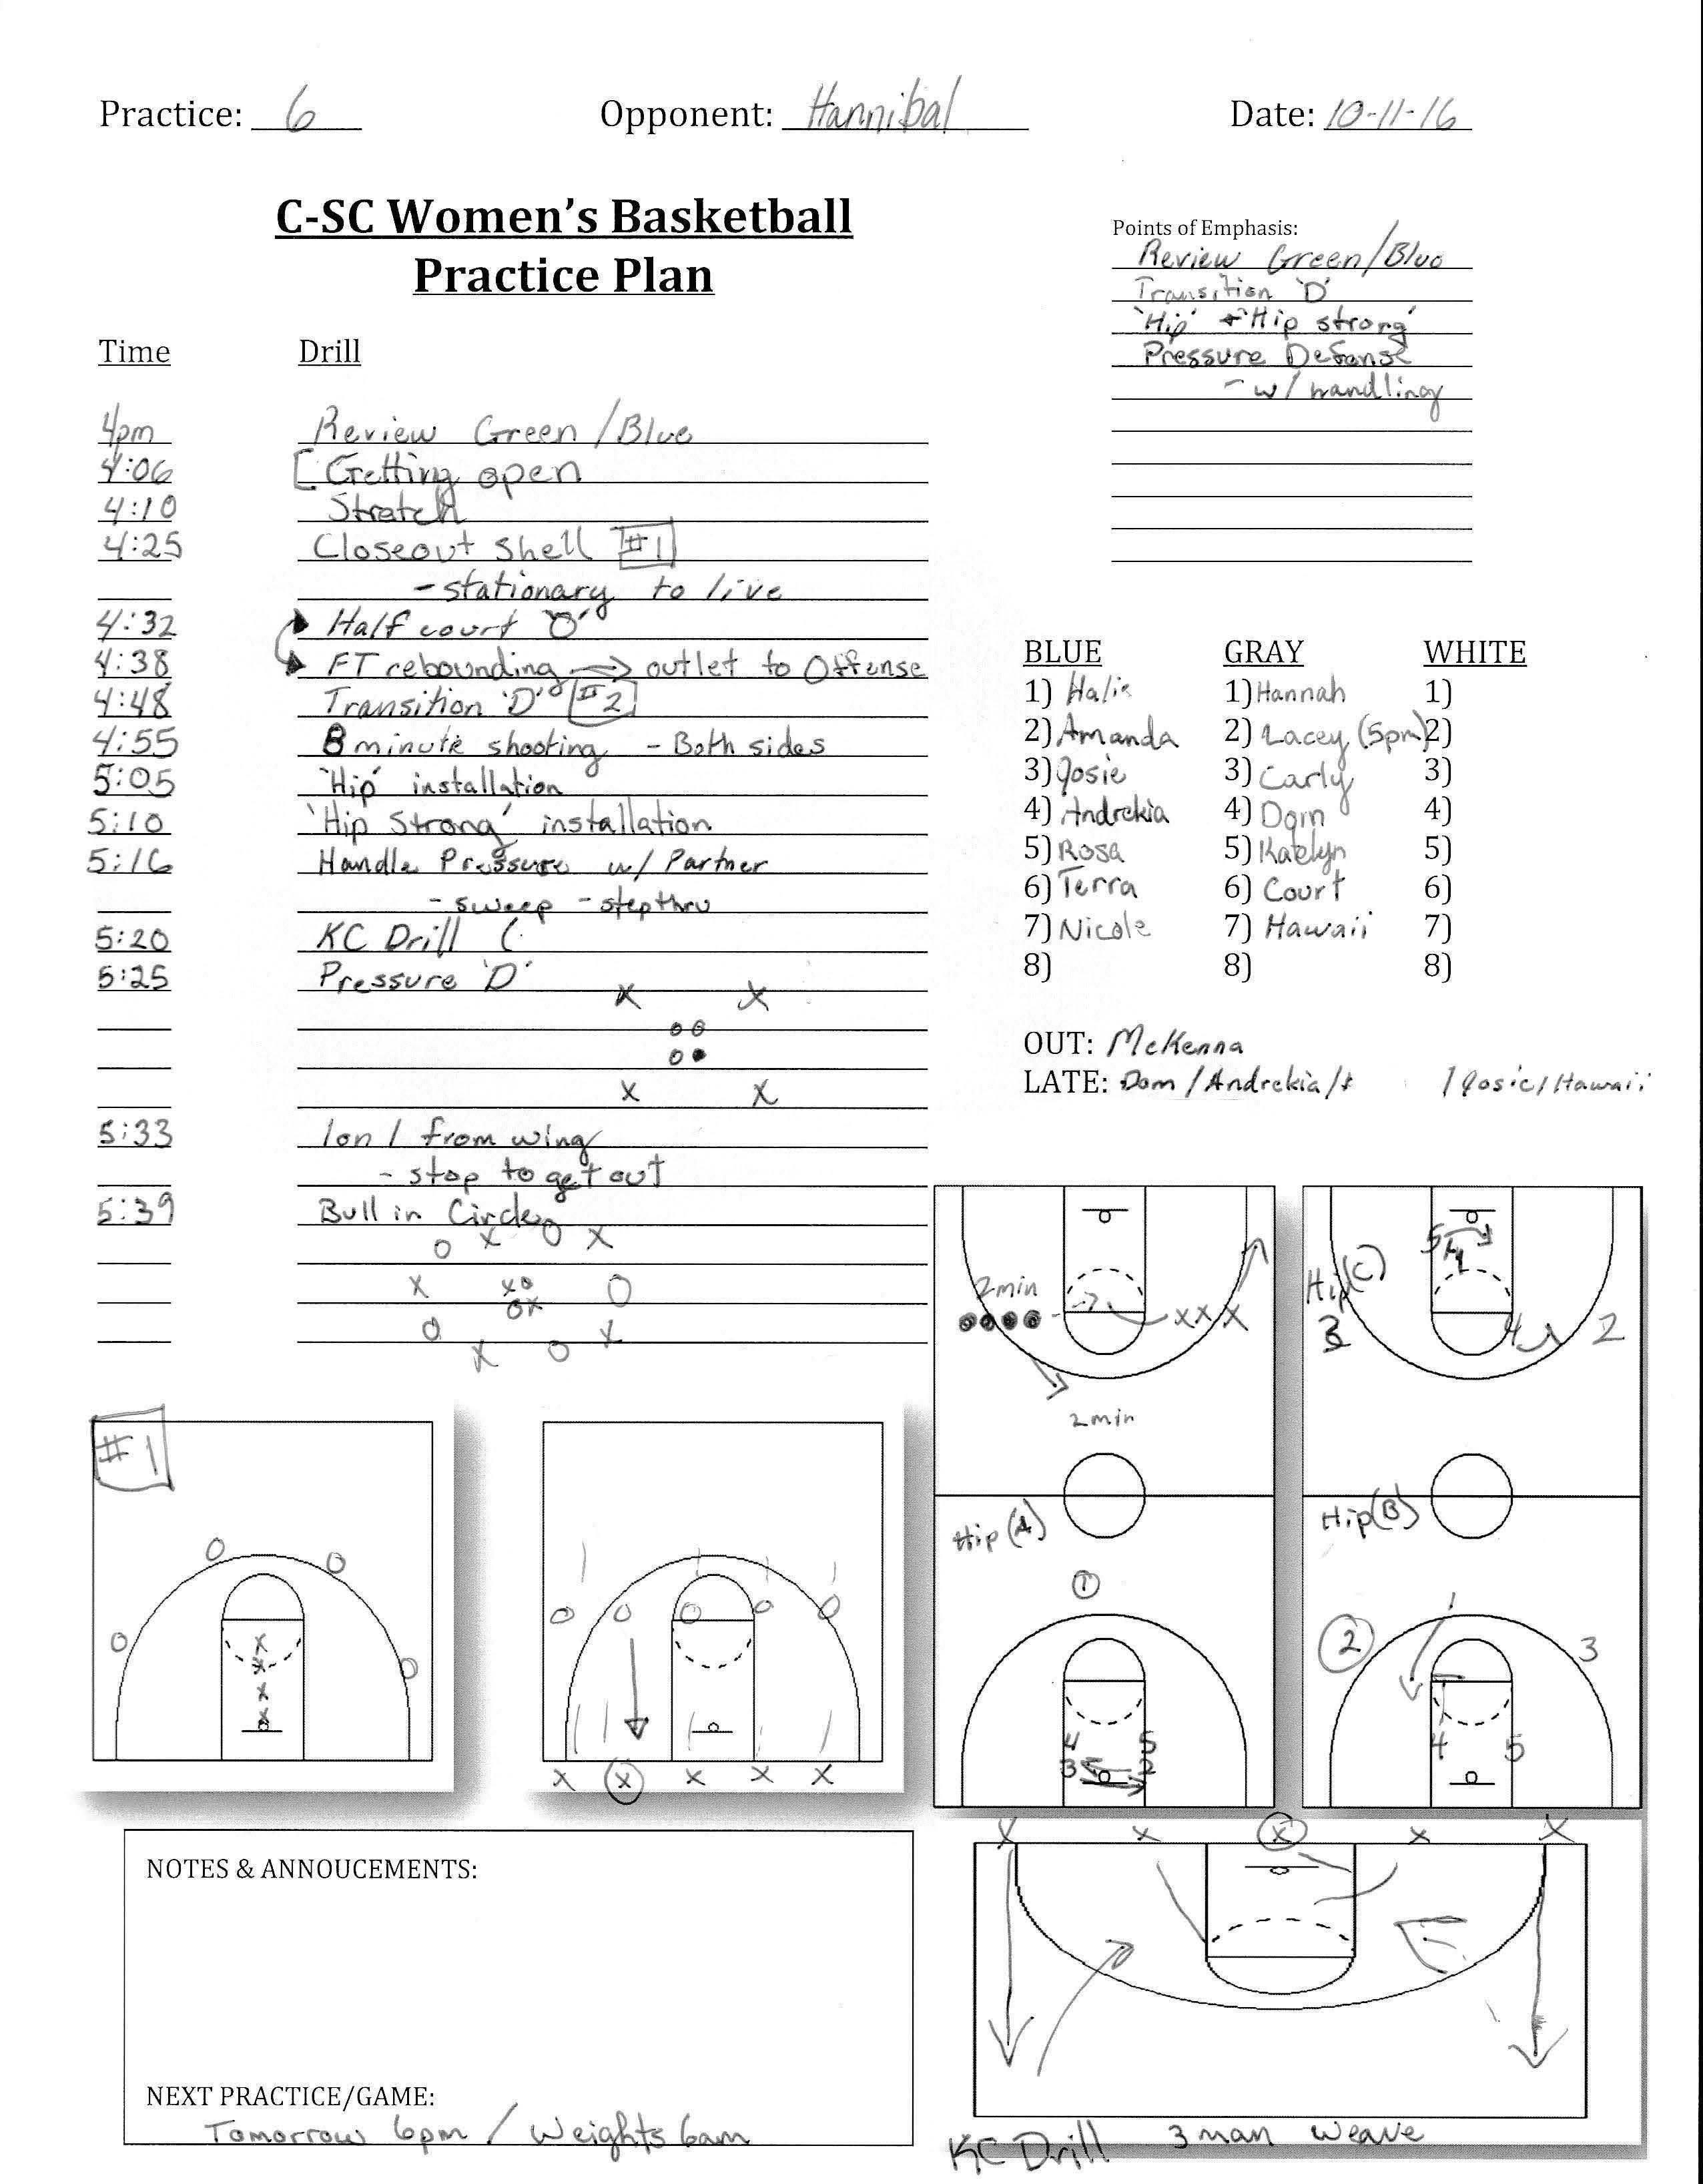 Midwest Elite Basketball Culver Stockton Wbb Practice Plan